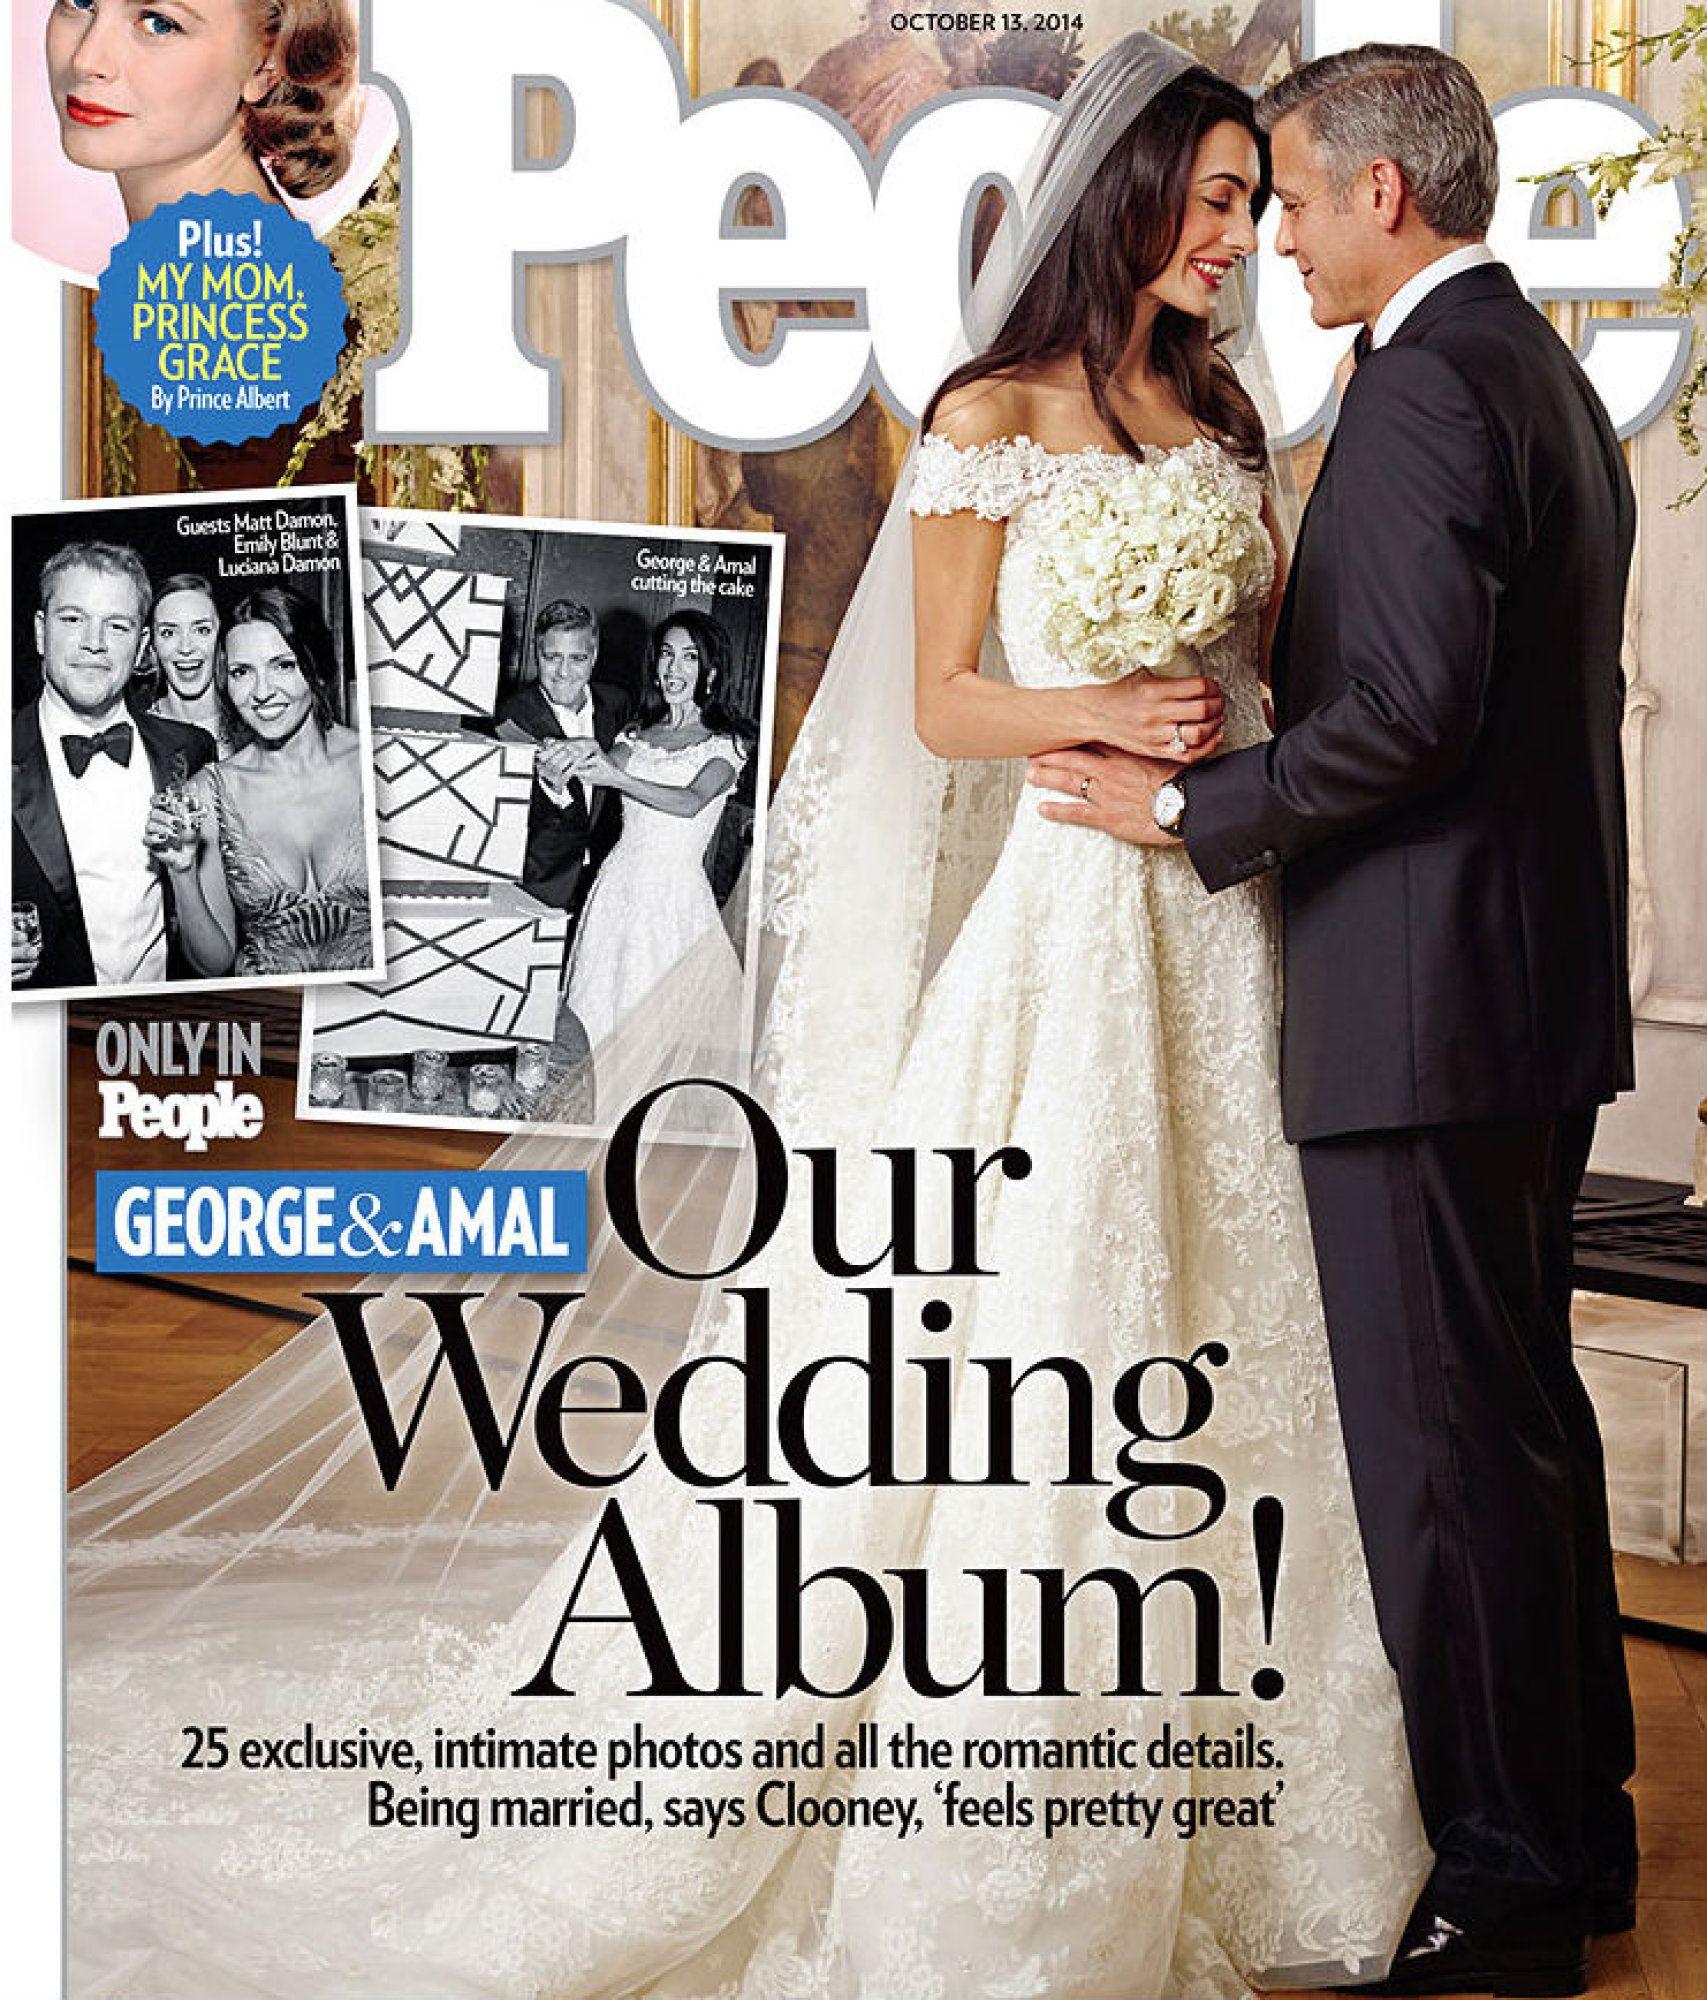 AMAL AND GORGE WEDDING - Oscar de la Renta dress